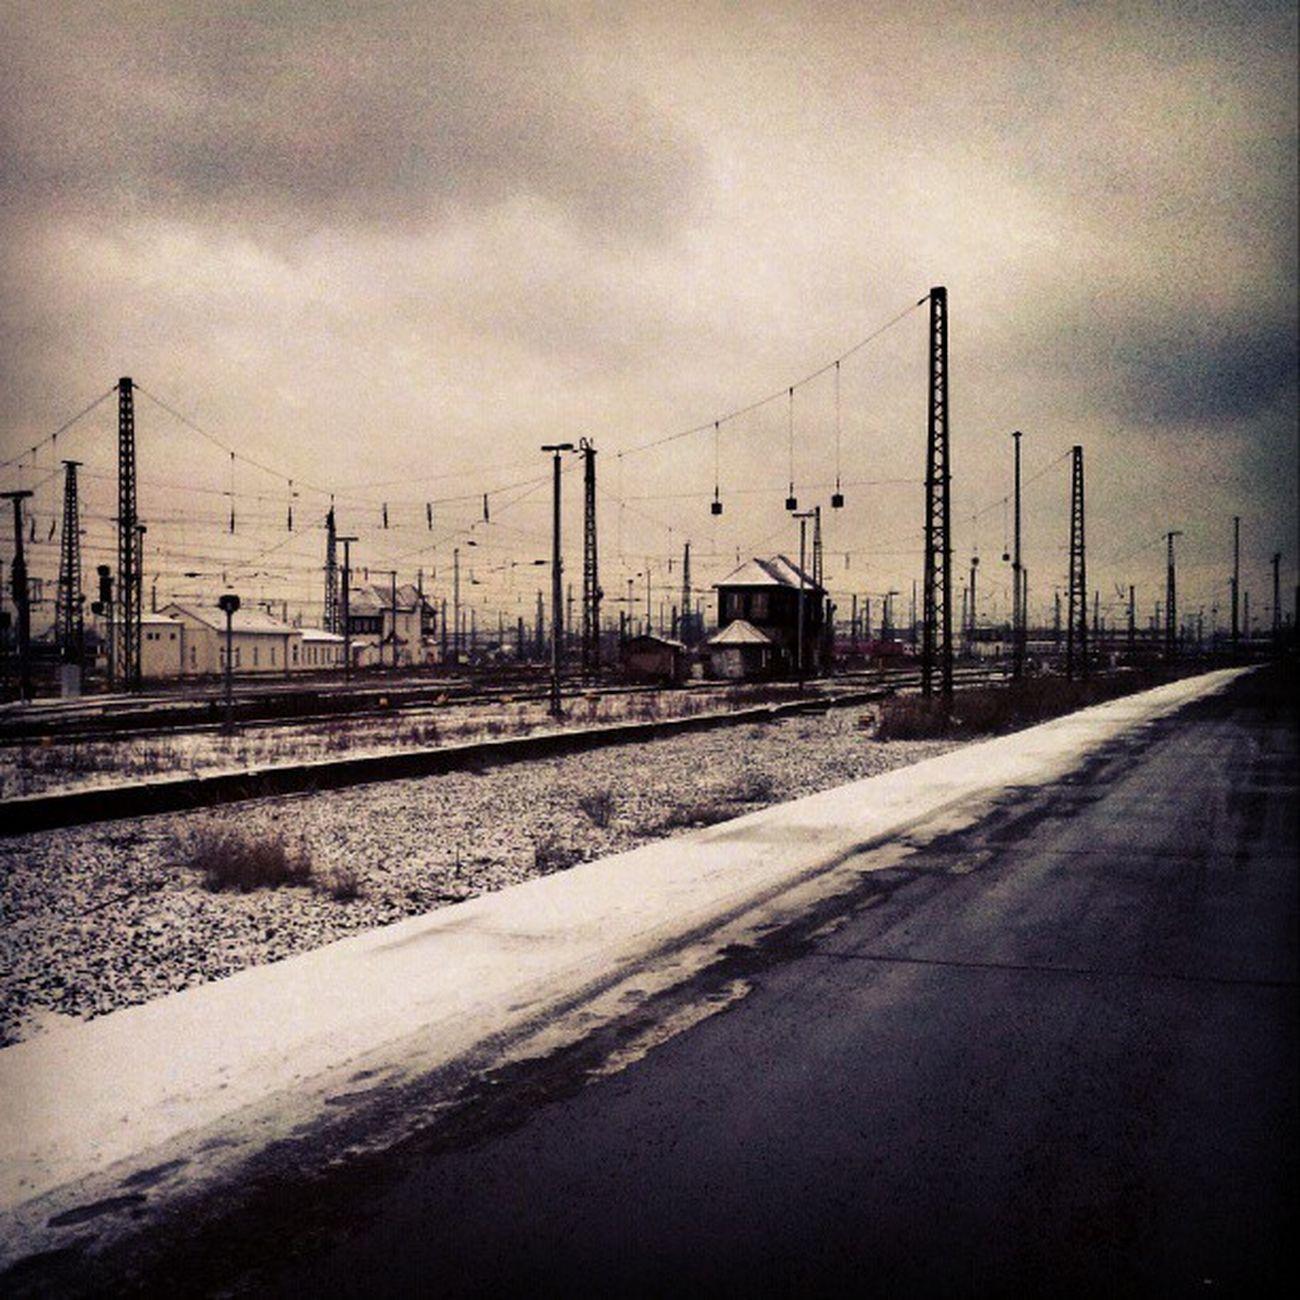 #leipzig #mainstation #train #station #snow #cold #fuckingcold #sutroalwayswins #city Urbano Landscapestyles_gf Sutroalwayswins City Fuckingcold Urban Train Station Cityscapes Snow Cold Leipzig Cityscape Urbanphotography Urbanlandscape Cityporn Mainstation